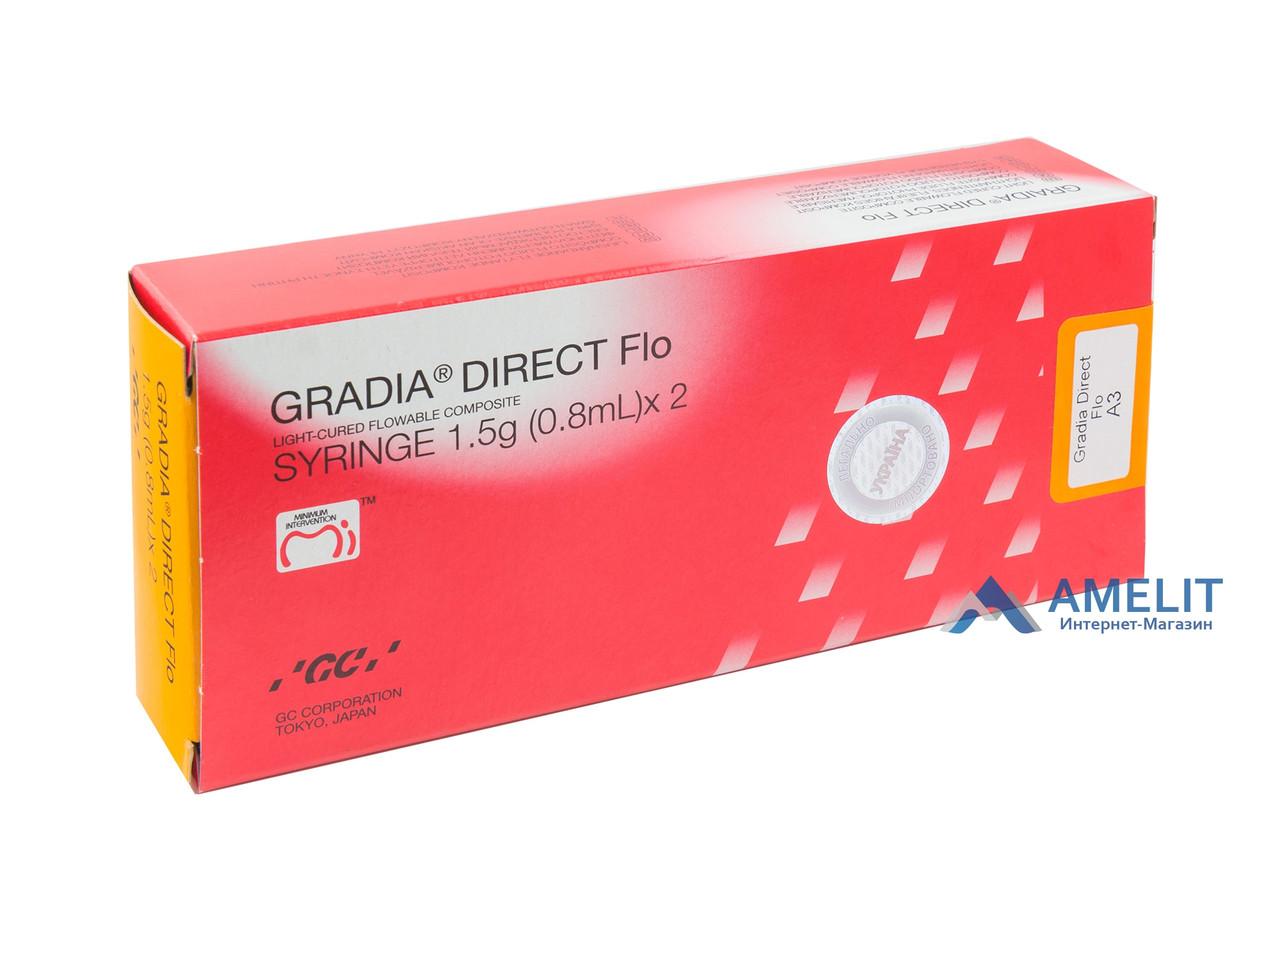 Градиа Дайрект Фло (Gradia Direct Flo, GC), шприц 1,5г